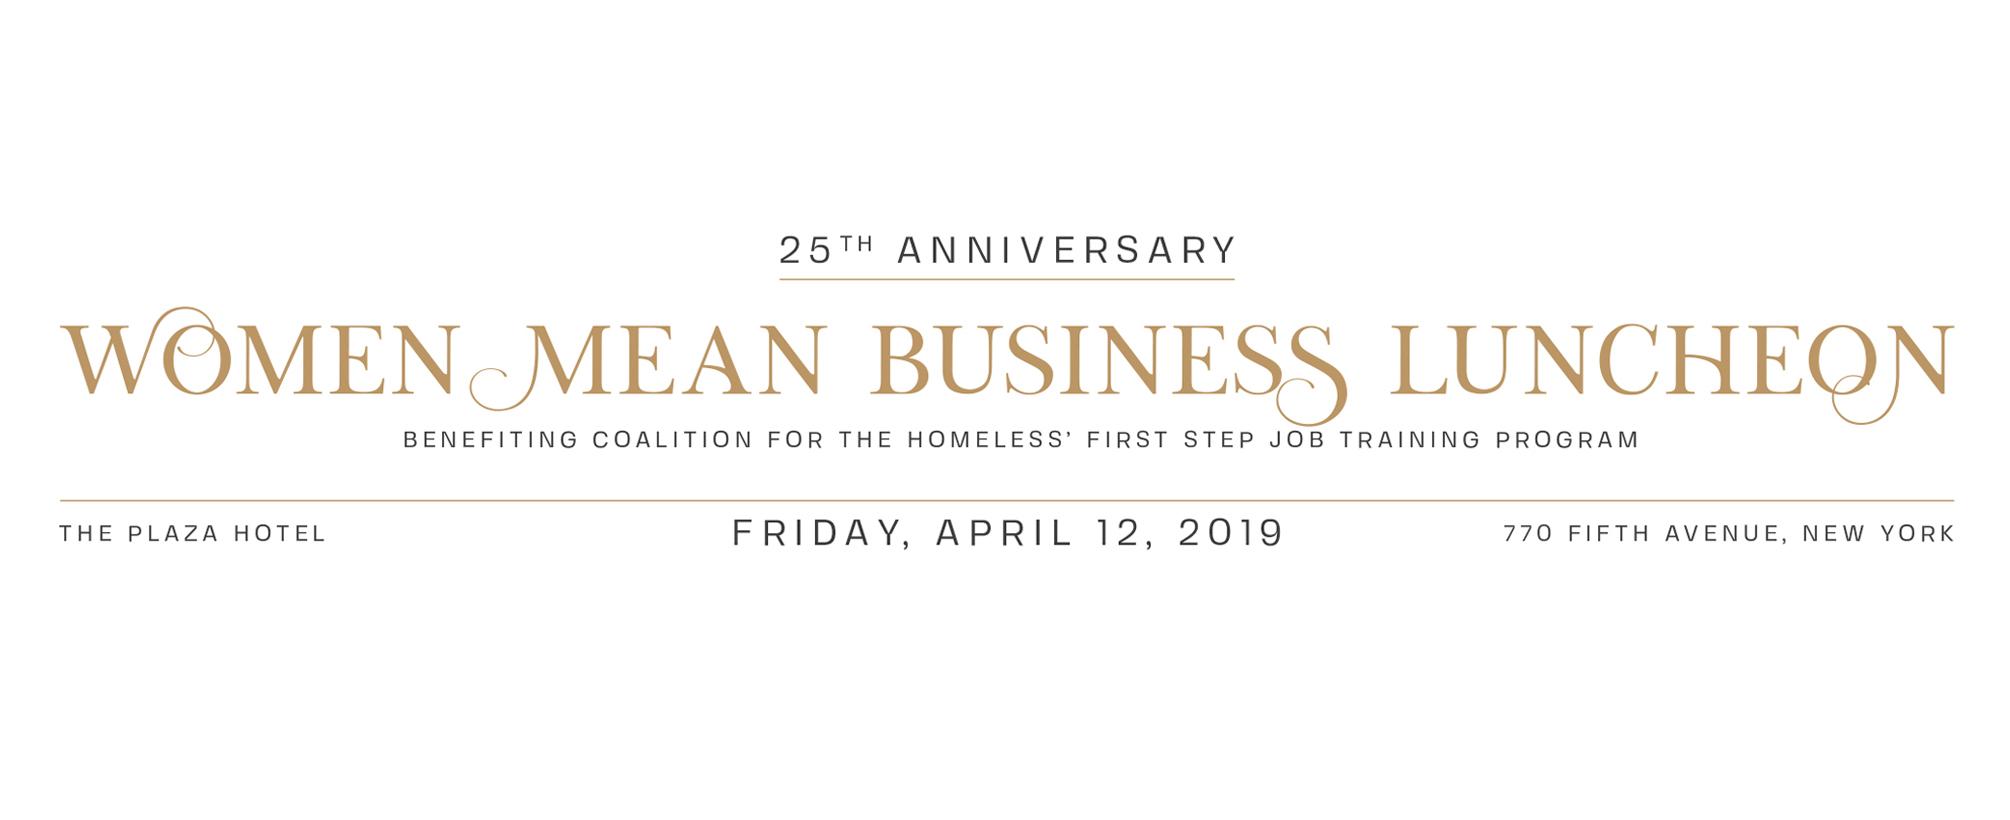 Women Mean Business Luncheon 2019